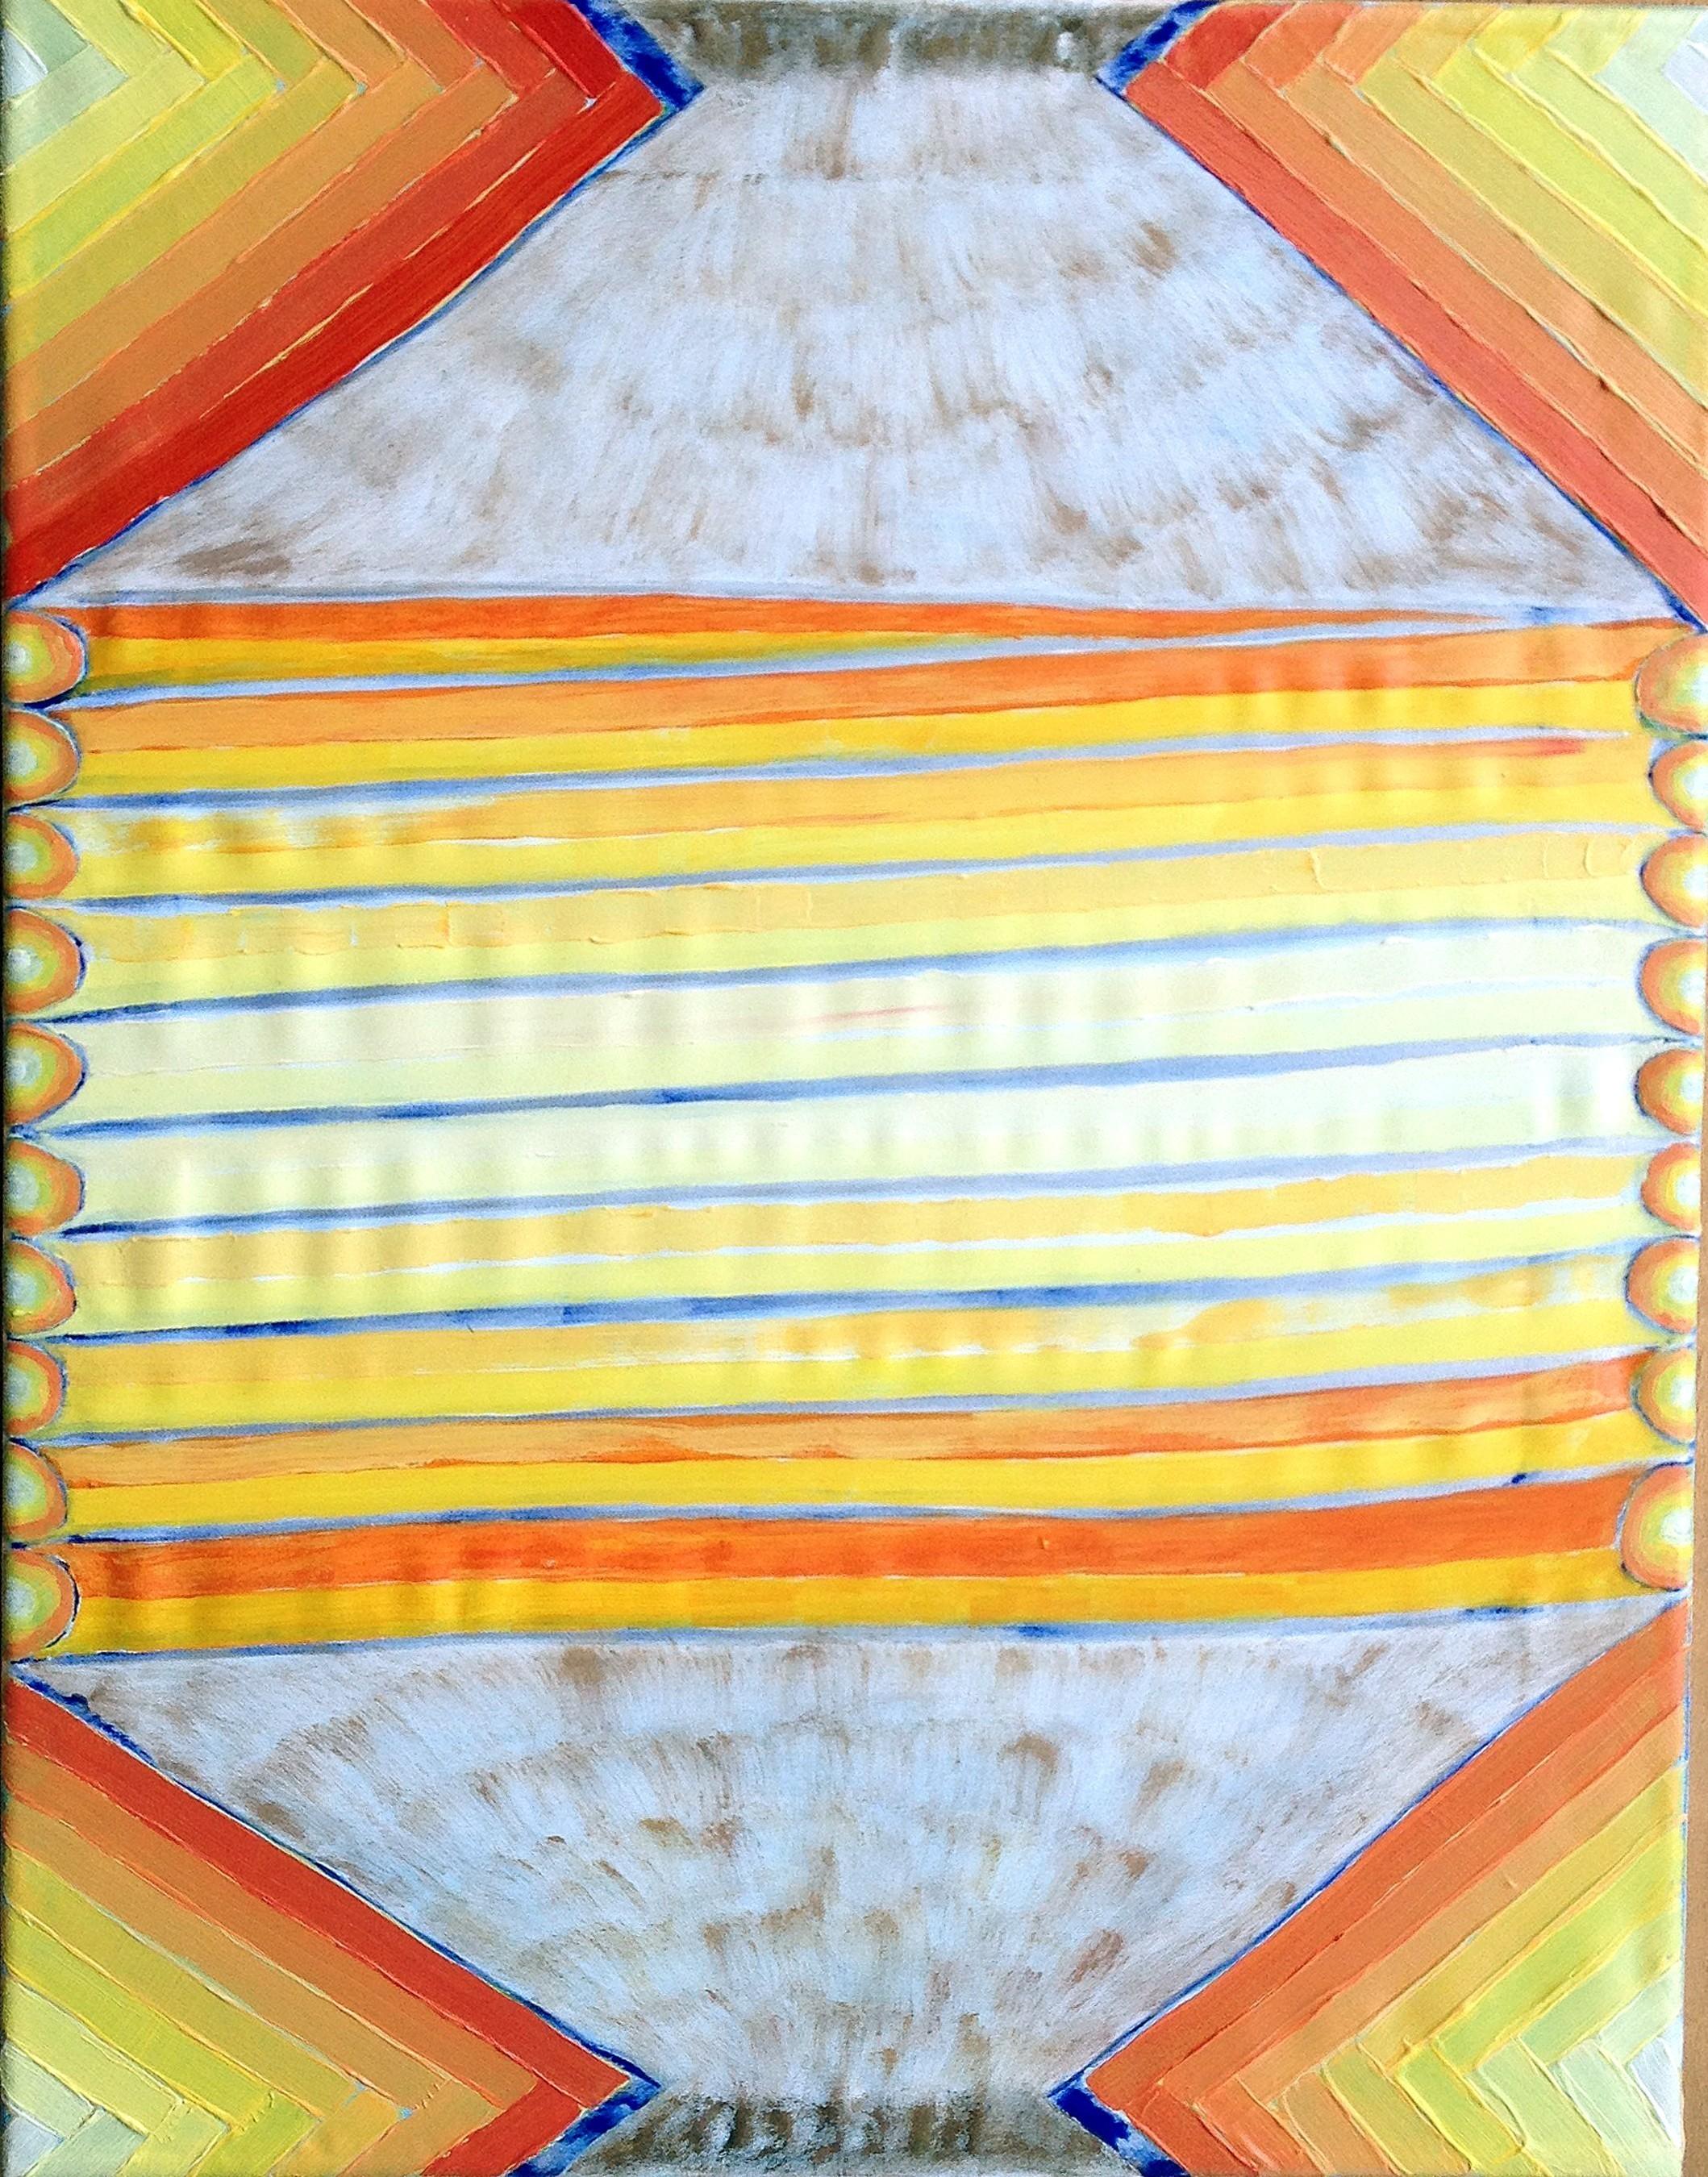 David Onri Anderson, Inner Flame Paper Lantern, 2017